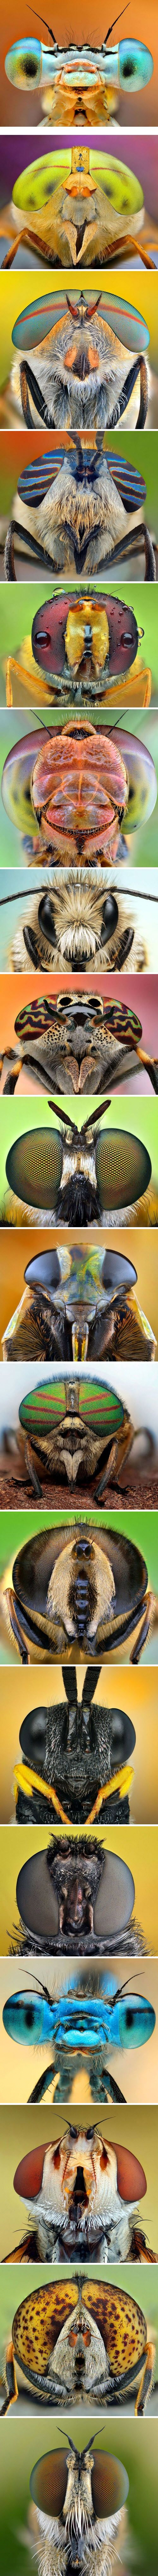 IPhotographer Ireneusz Irass Waledzik - collection of fascinating facet eyes of dragonflies, bees and flies.